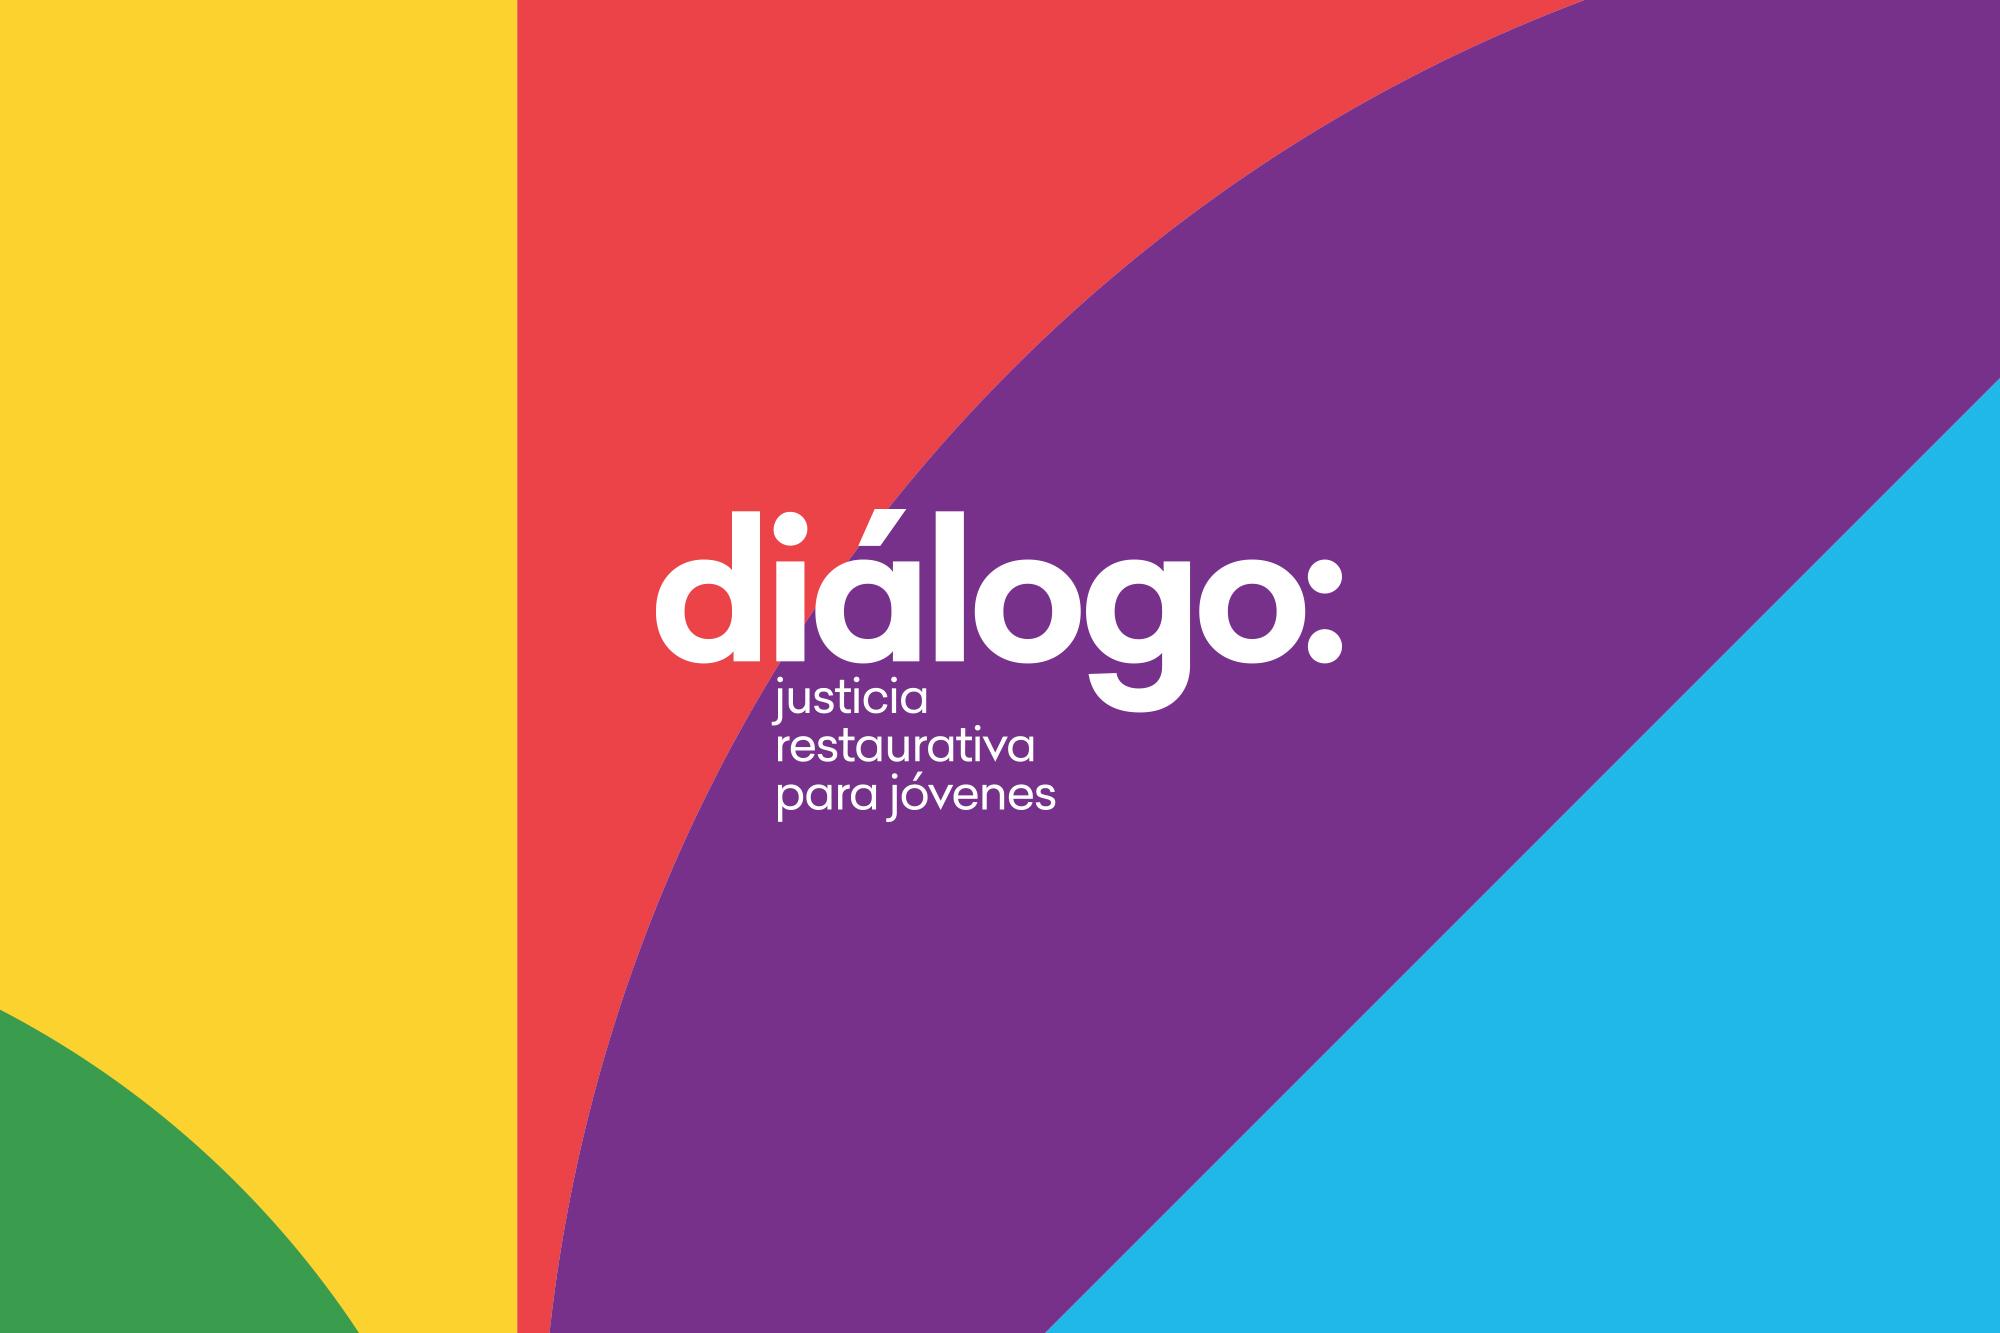 Montenegro Creative Studio - Diálogo1.jpg